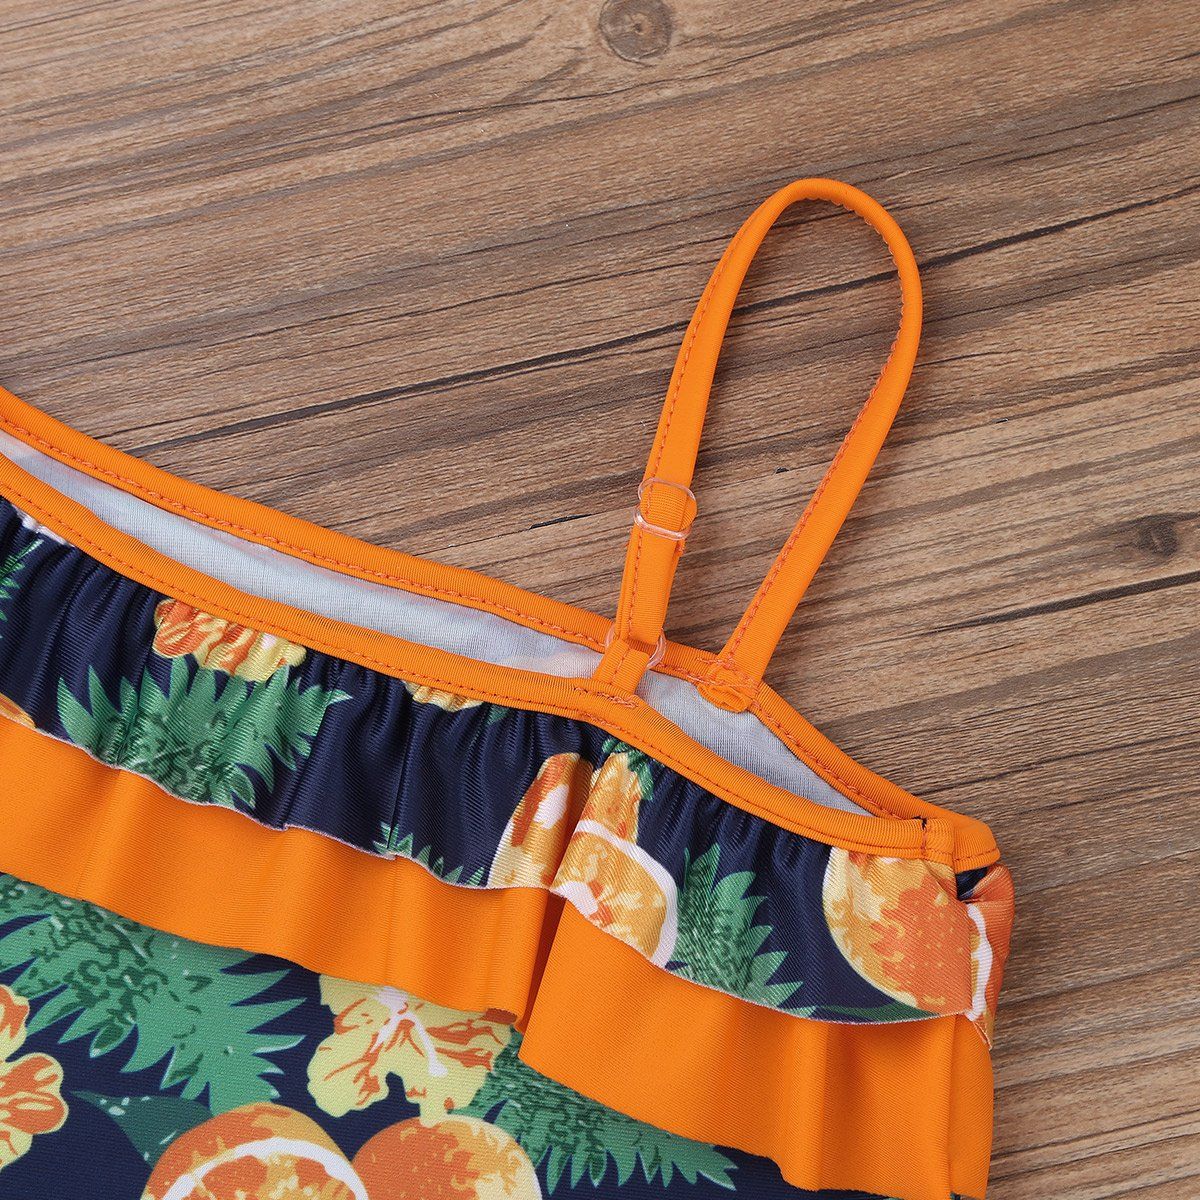 YiZYiF Kids Girls Fashion Lemon Ruffles One Shoulder Swimsuit Swimwear Bathing Suit with Adjustable Strap